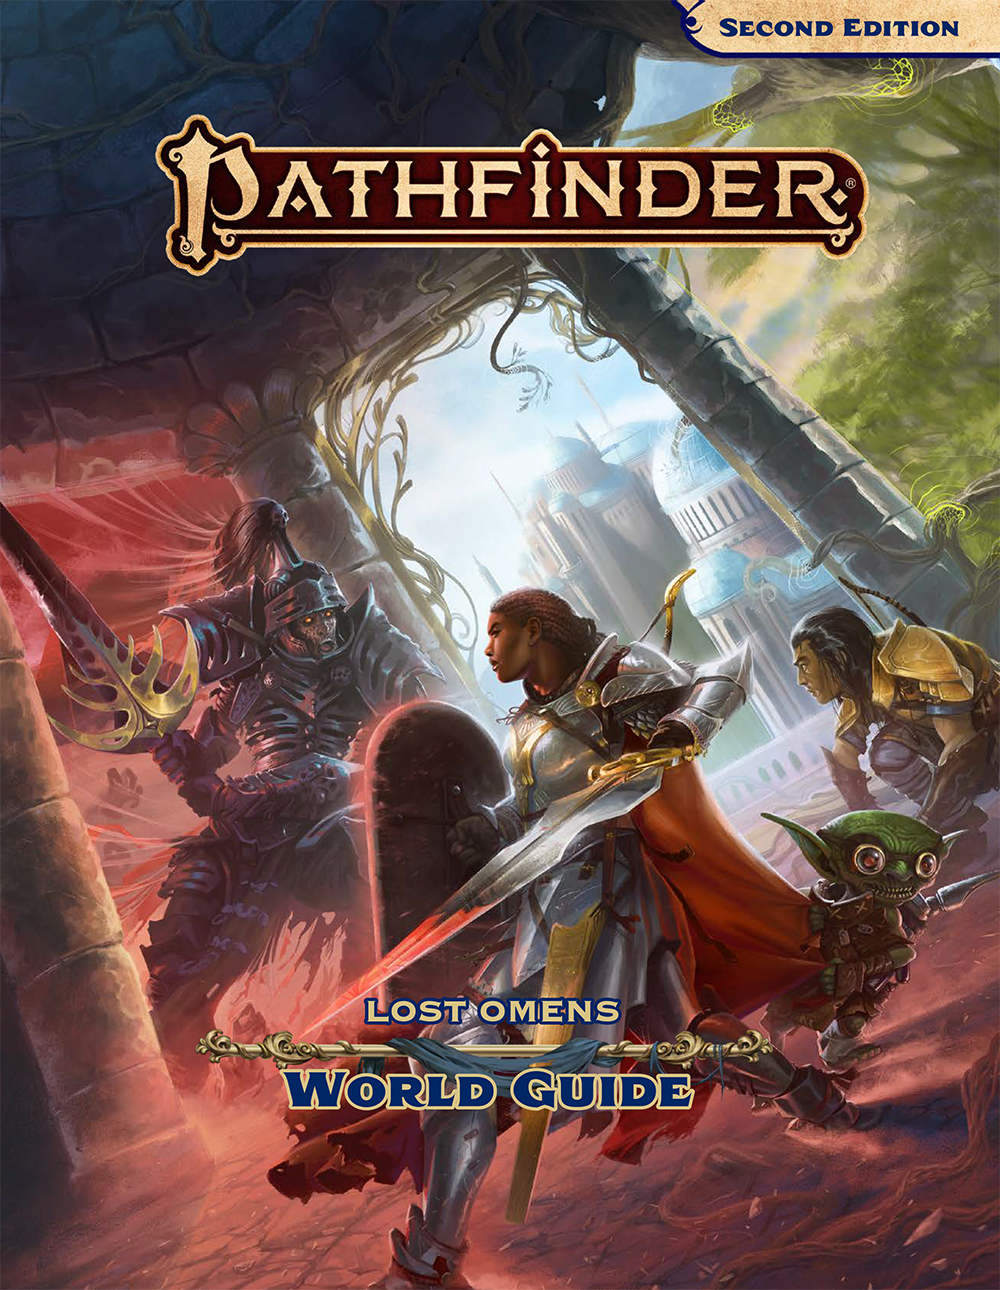 A Plethora of Pathfinder! – Lone Wolf Development